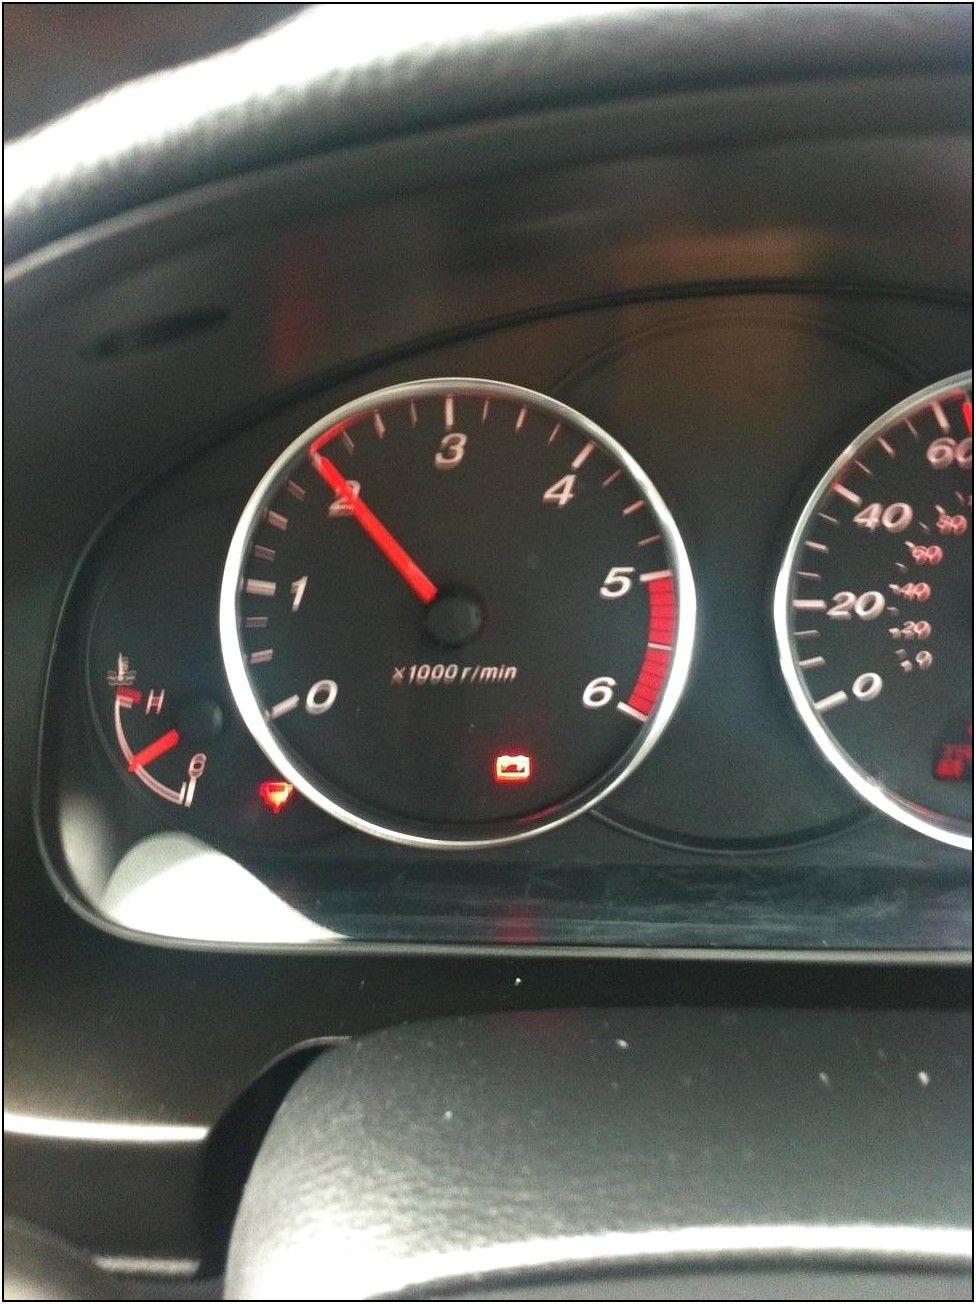 Mazda symbol pictures httpjustcontinentalcarsmazda mazda symbol pictures httpjustcontinentalcarsmazda buycottarizona